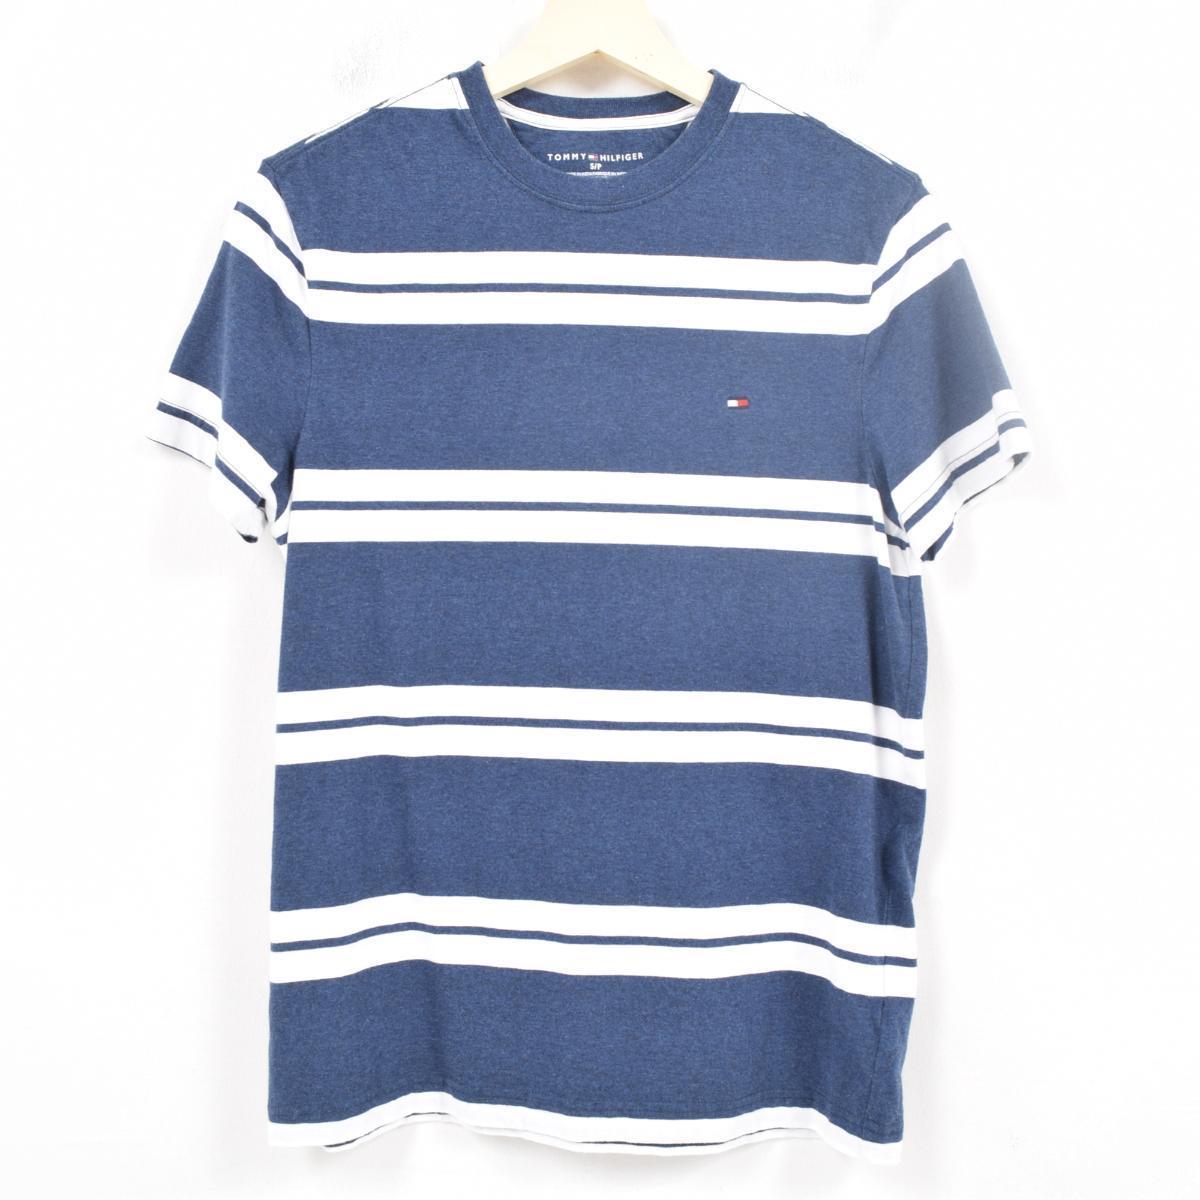 d800df7cae トミーヒルフィガー TOMMY HILFIGER horizontal stripe T-shirt men S /wap8798 ...